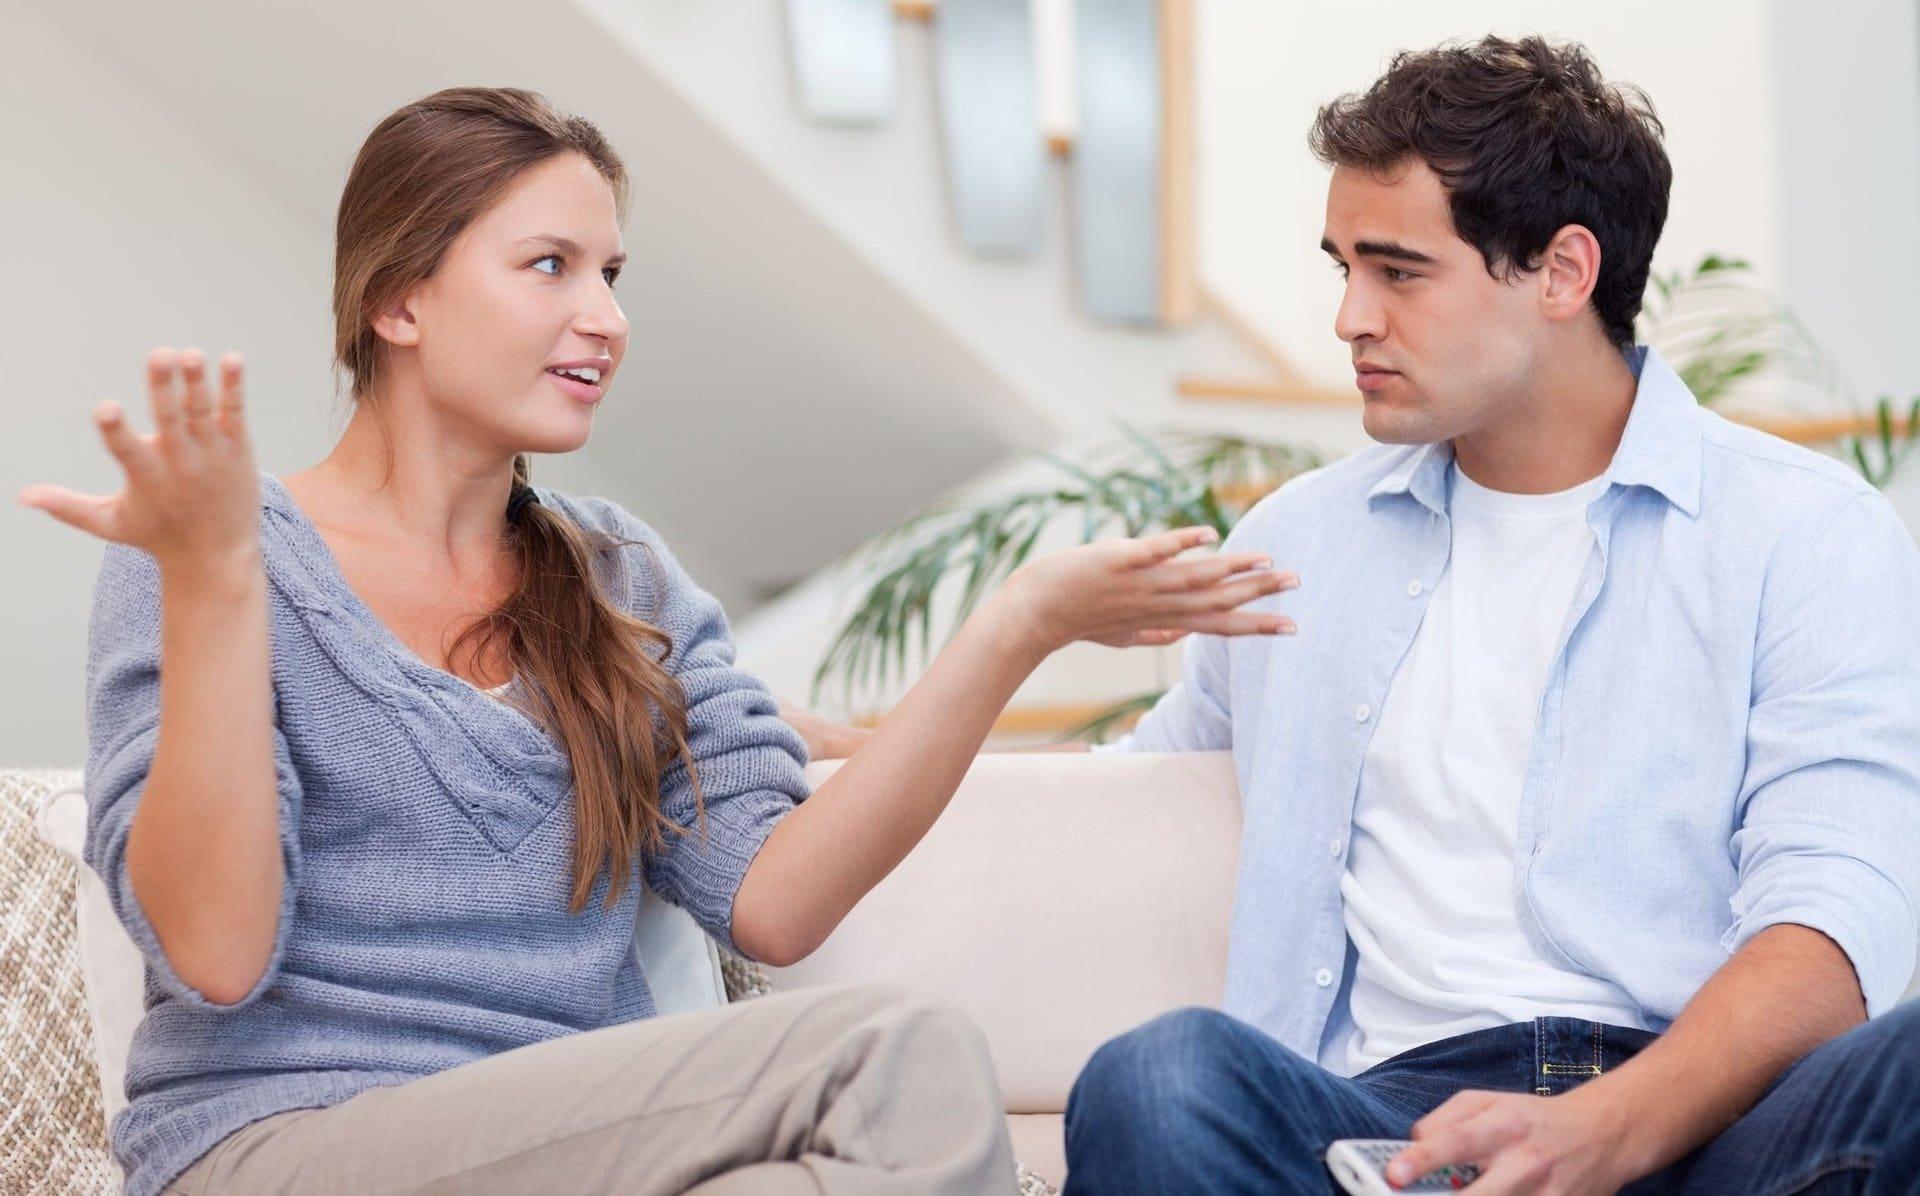 Мужчина и женщина беседуют